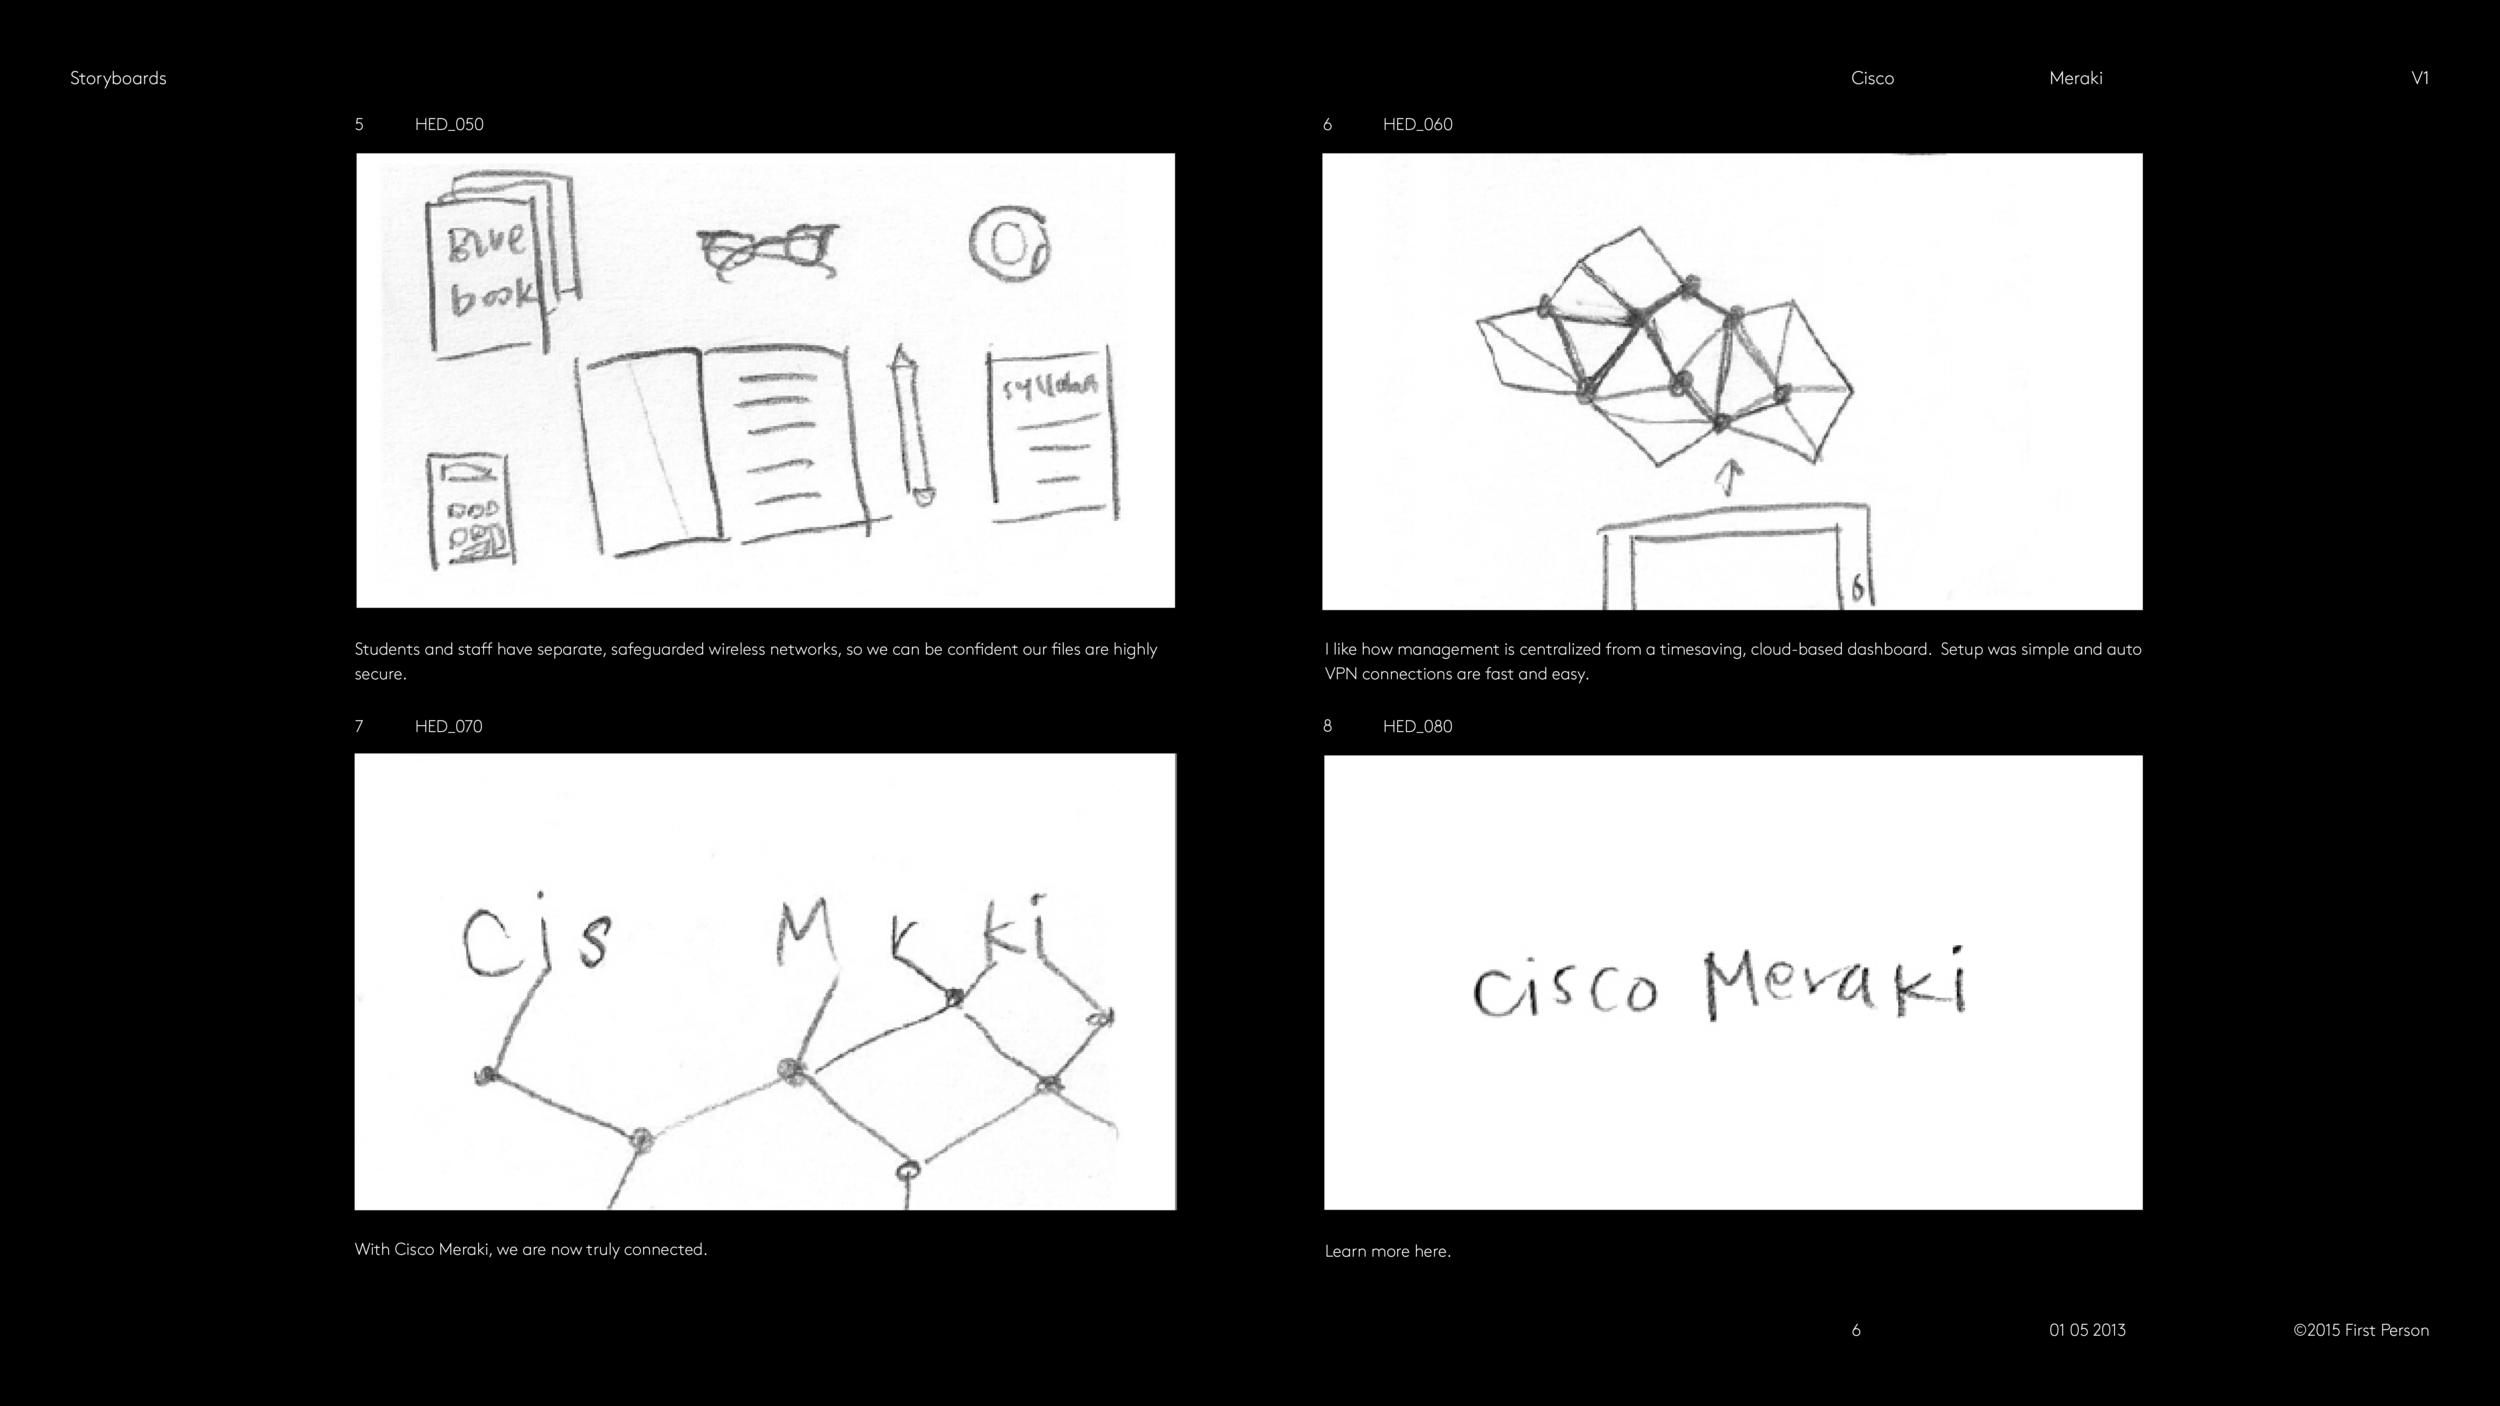 3431_CiscoMeraki_Storyboards_v01-6.png